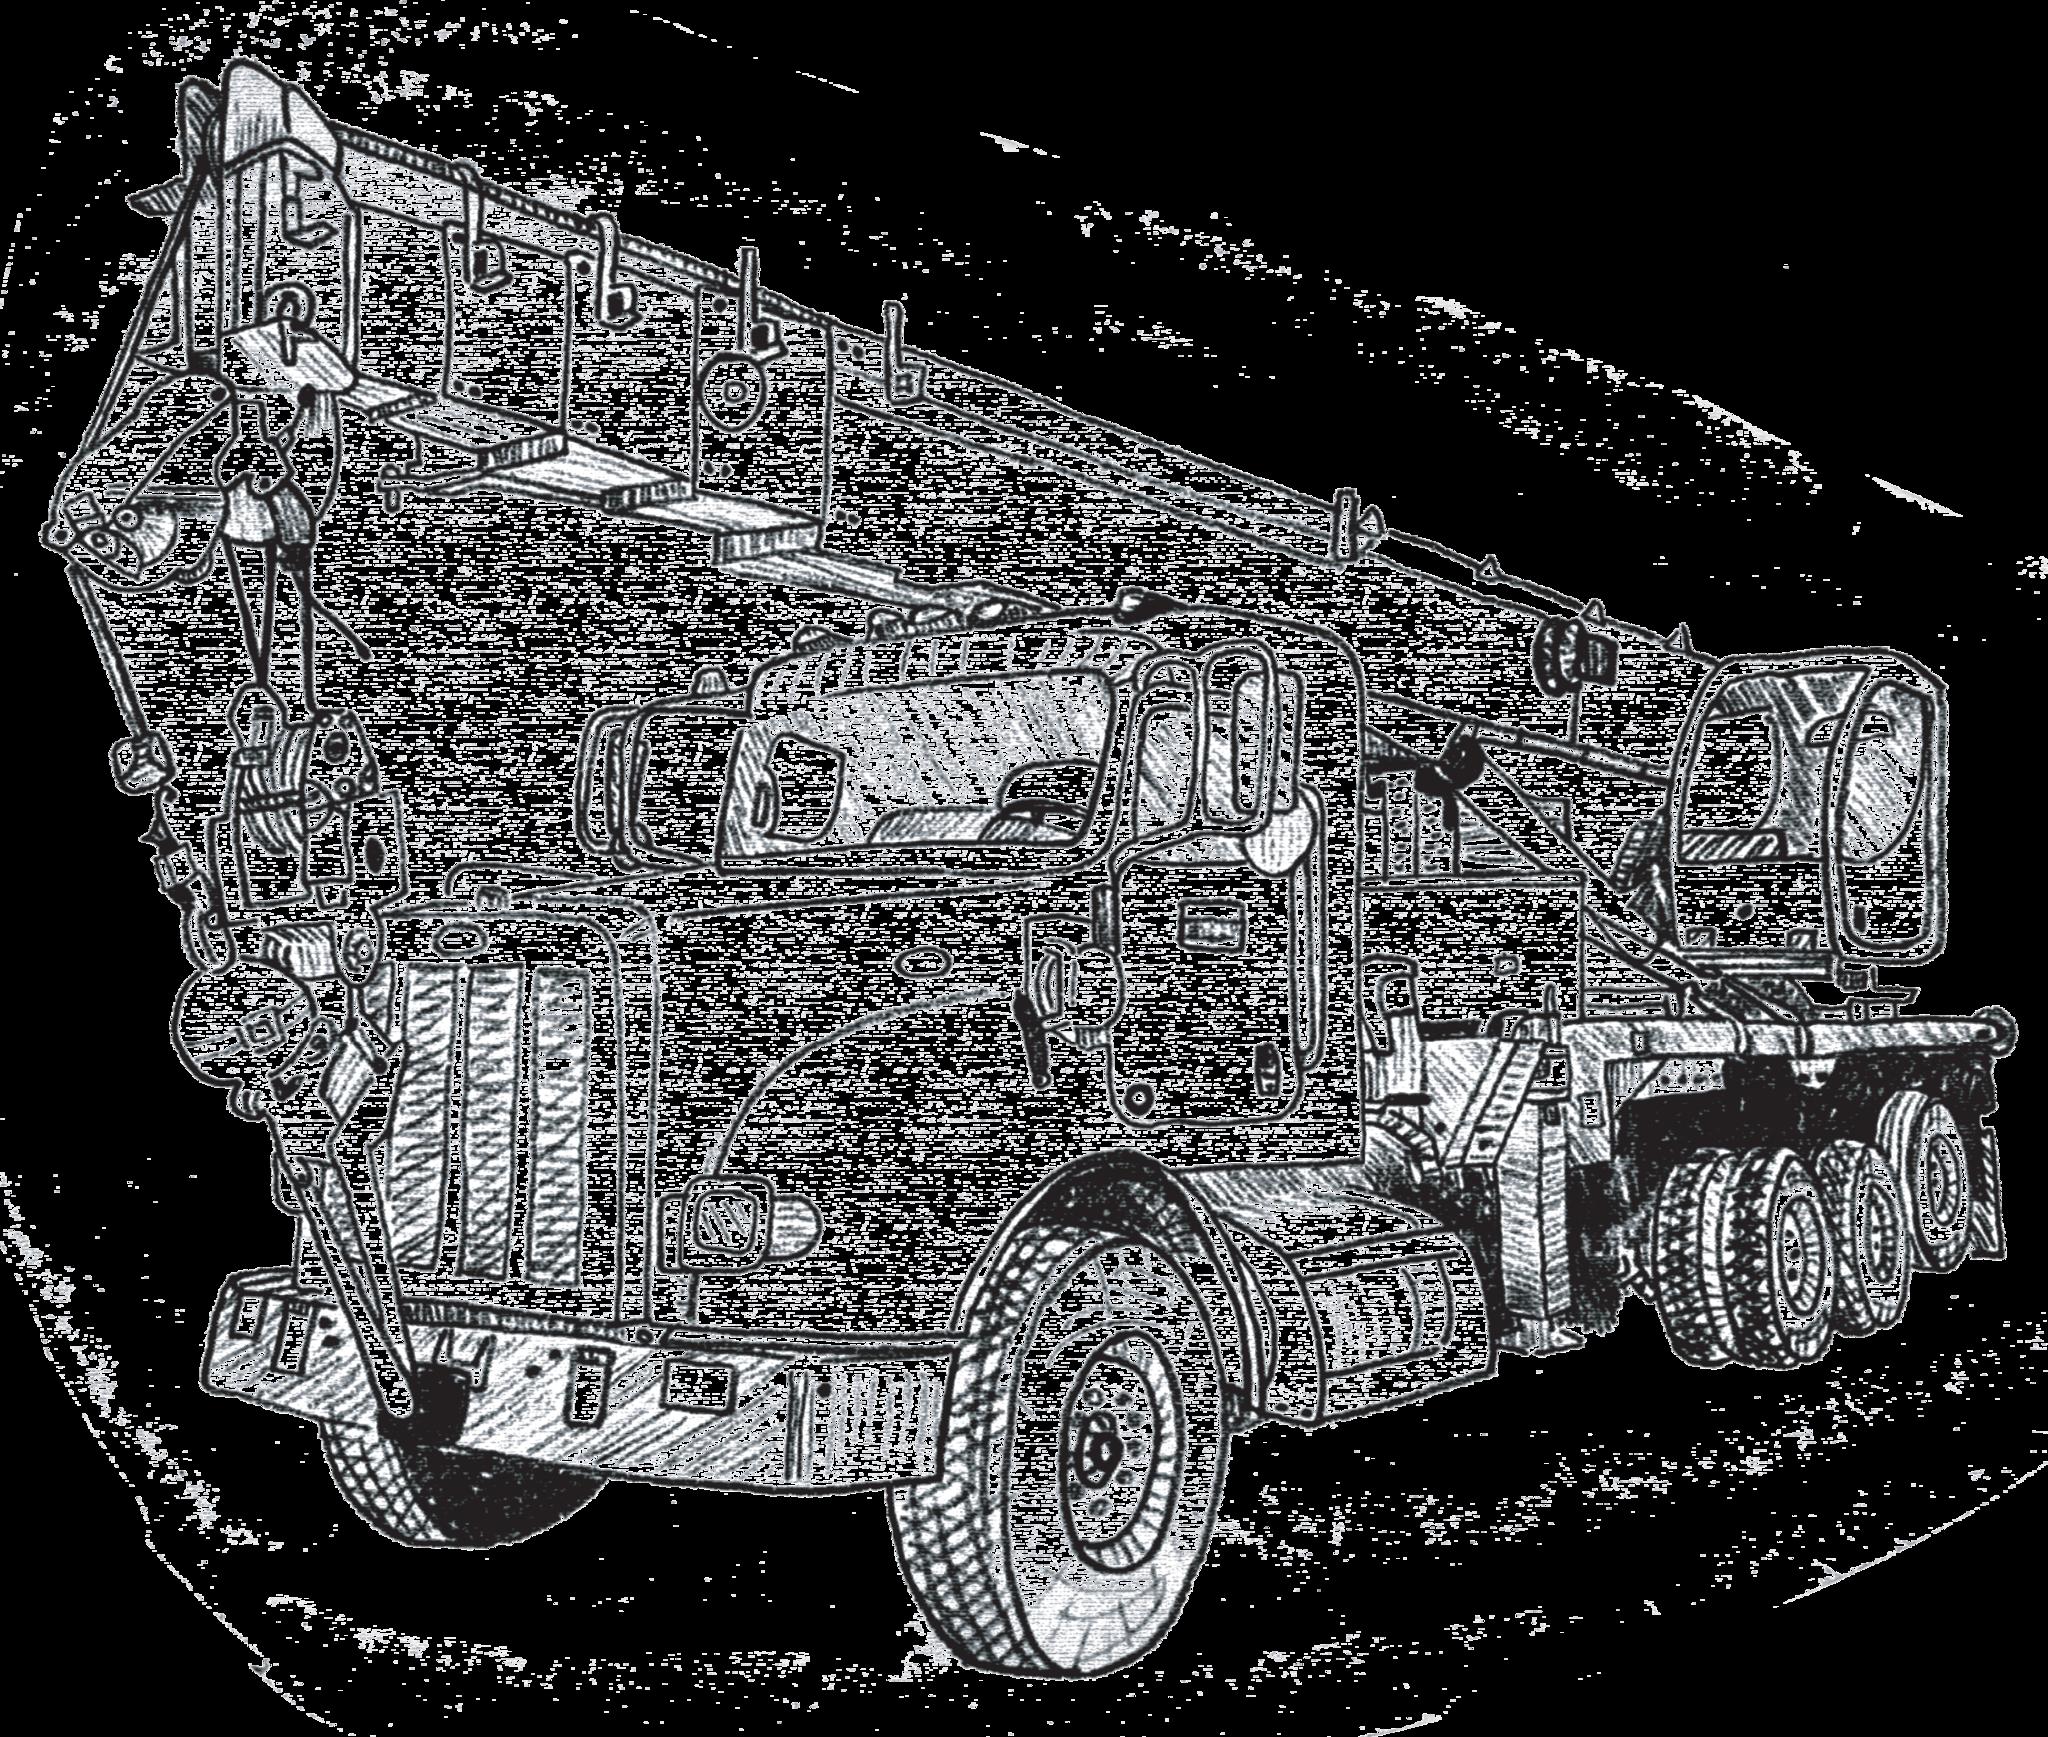 crane truck drawing at getdrawings com